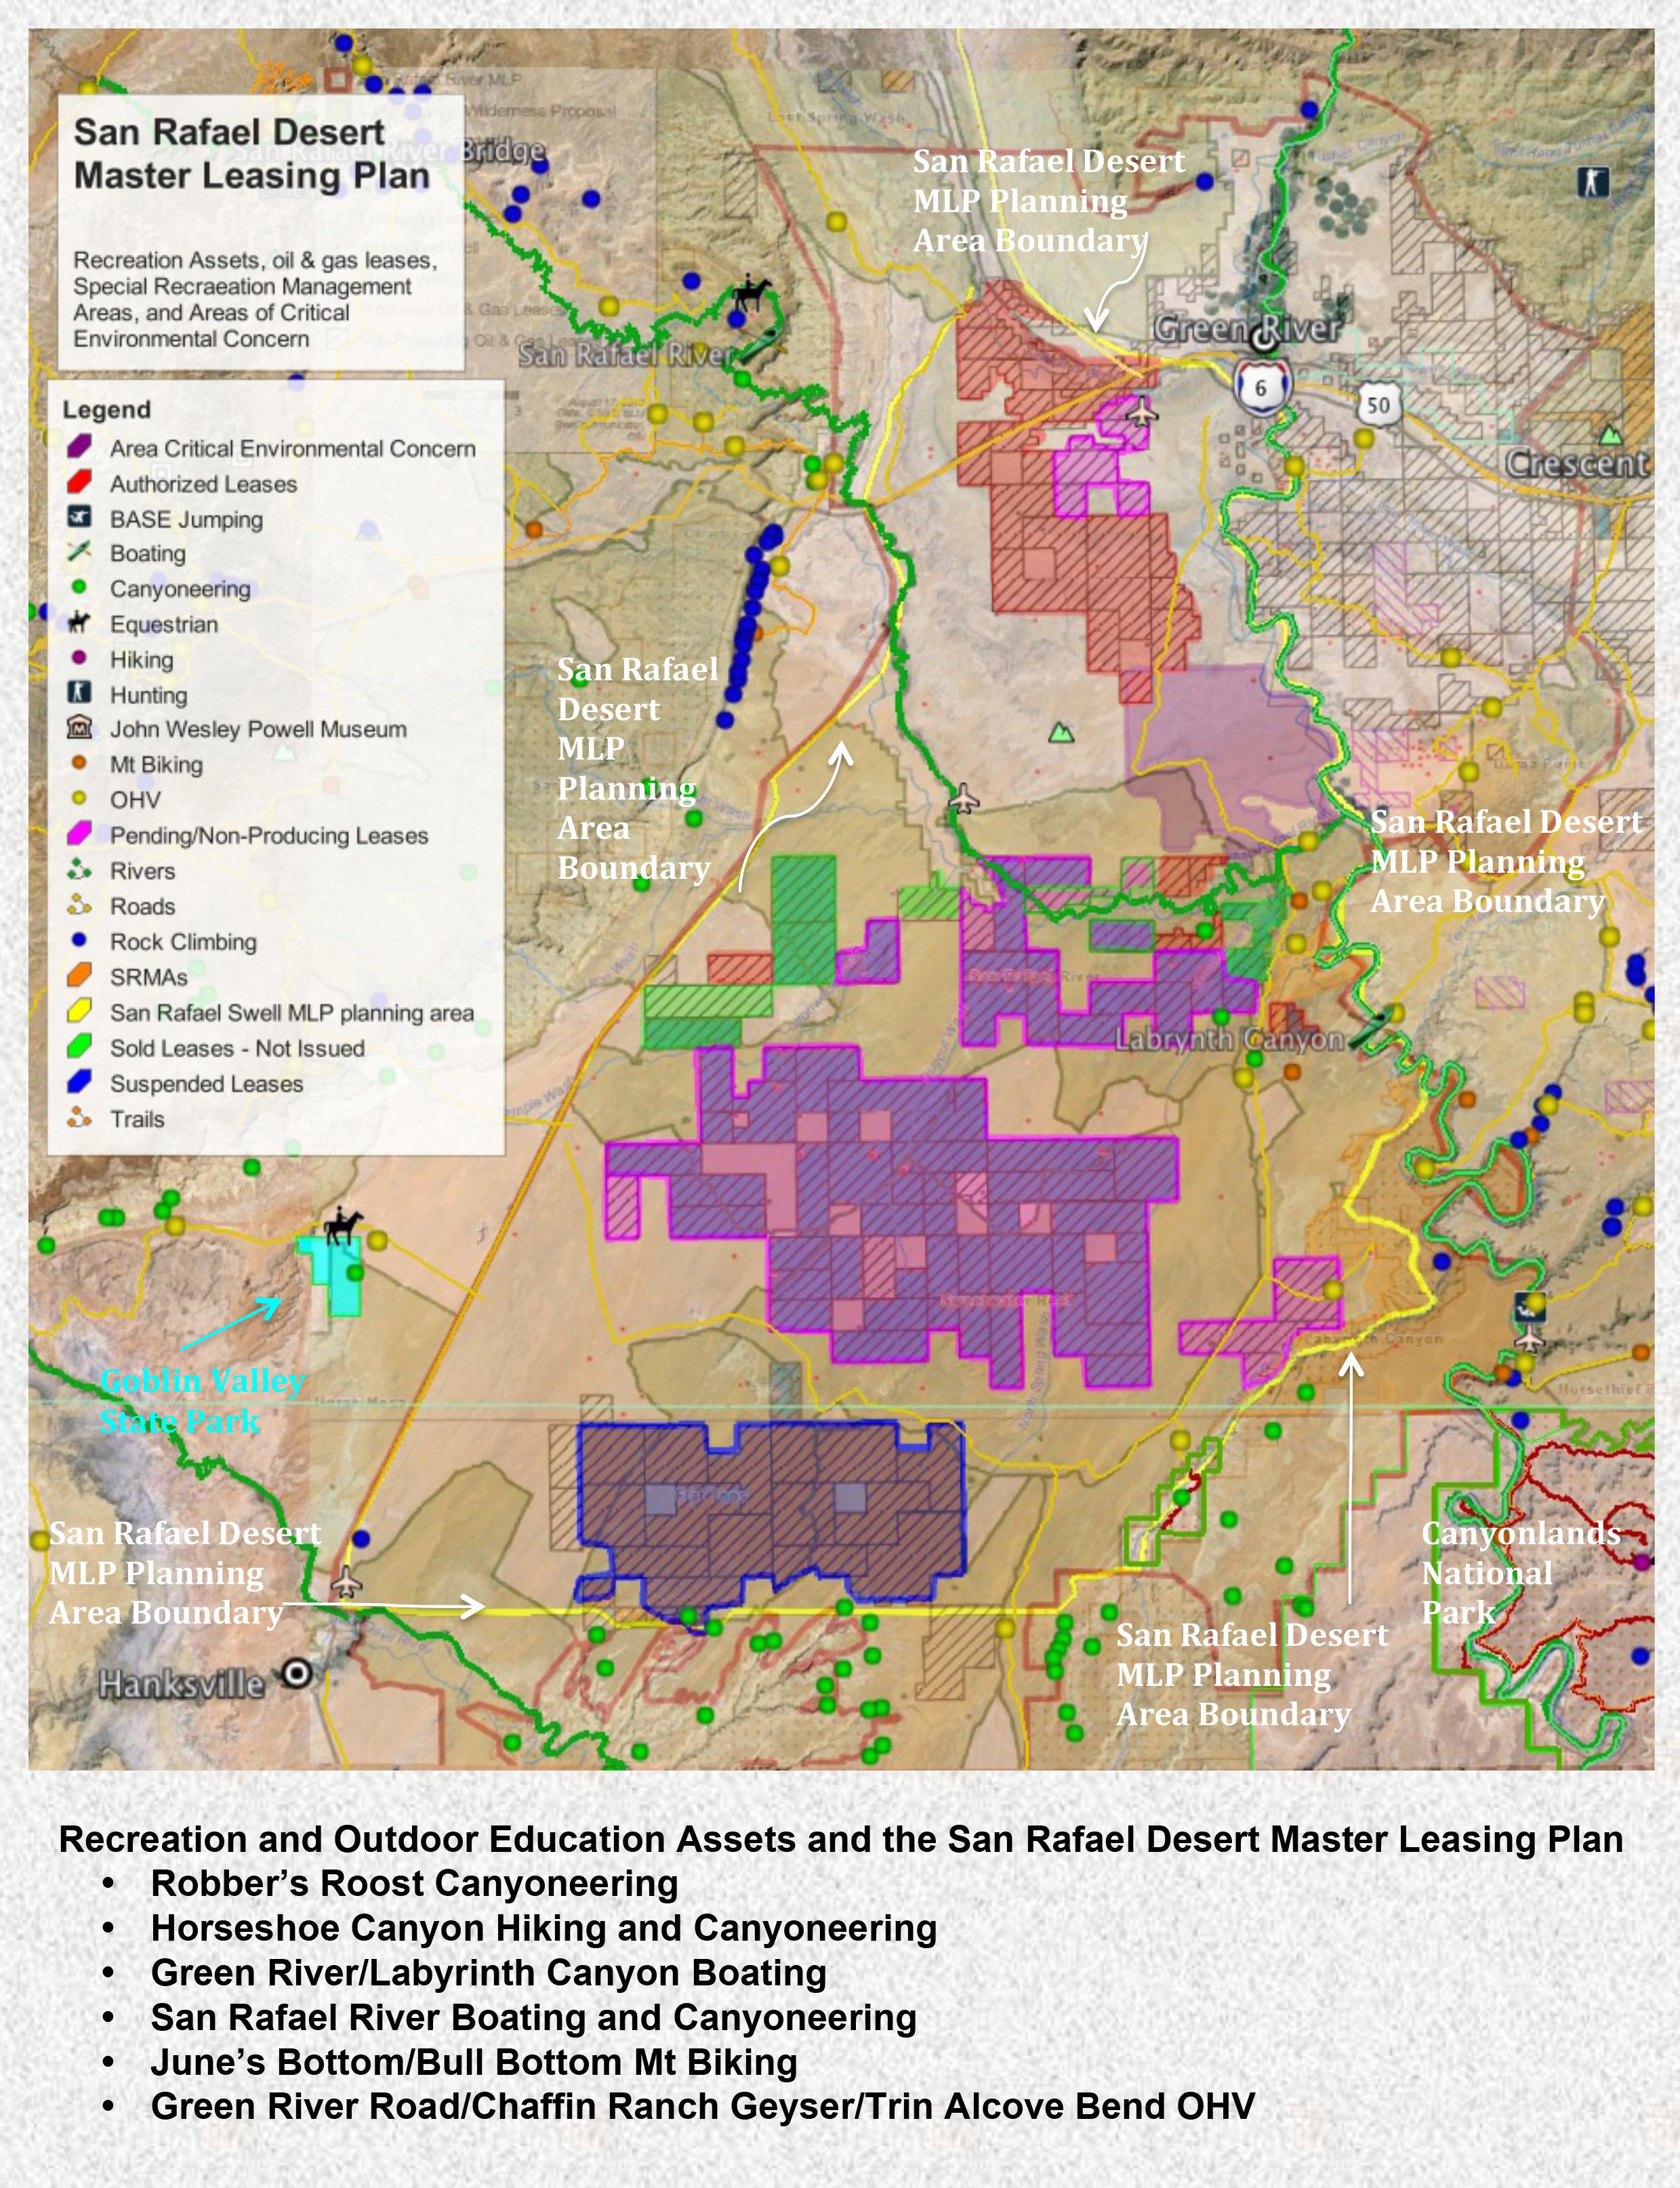 Utah BLM Announces Master Leasing Plan for San Rafael Desert ...